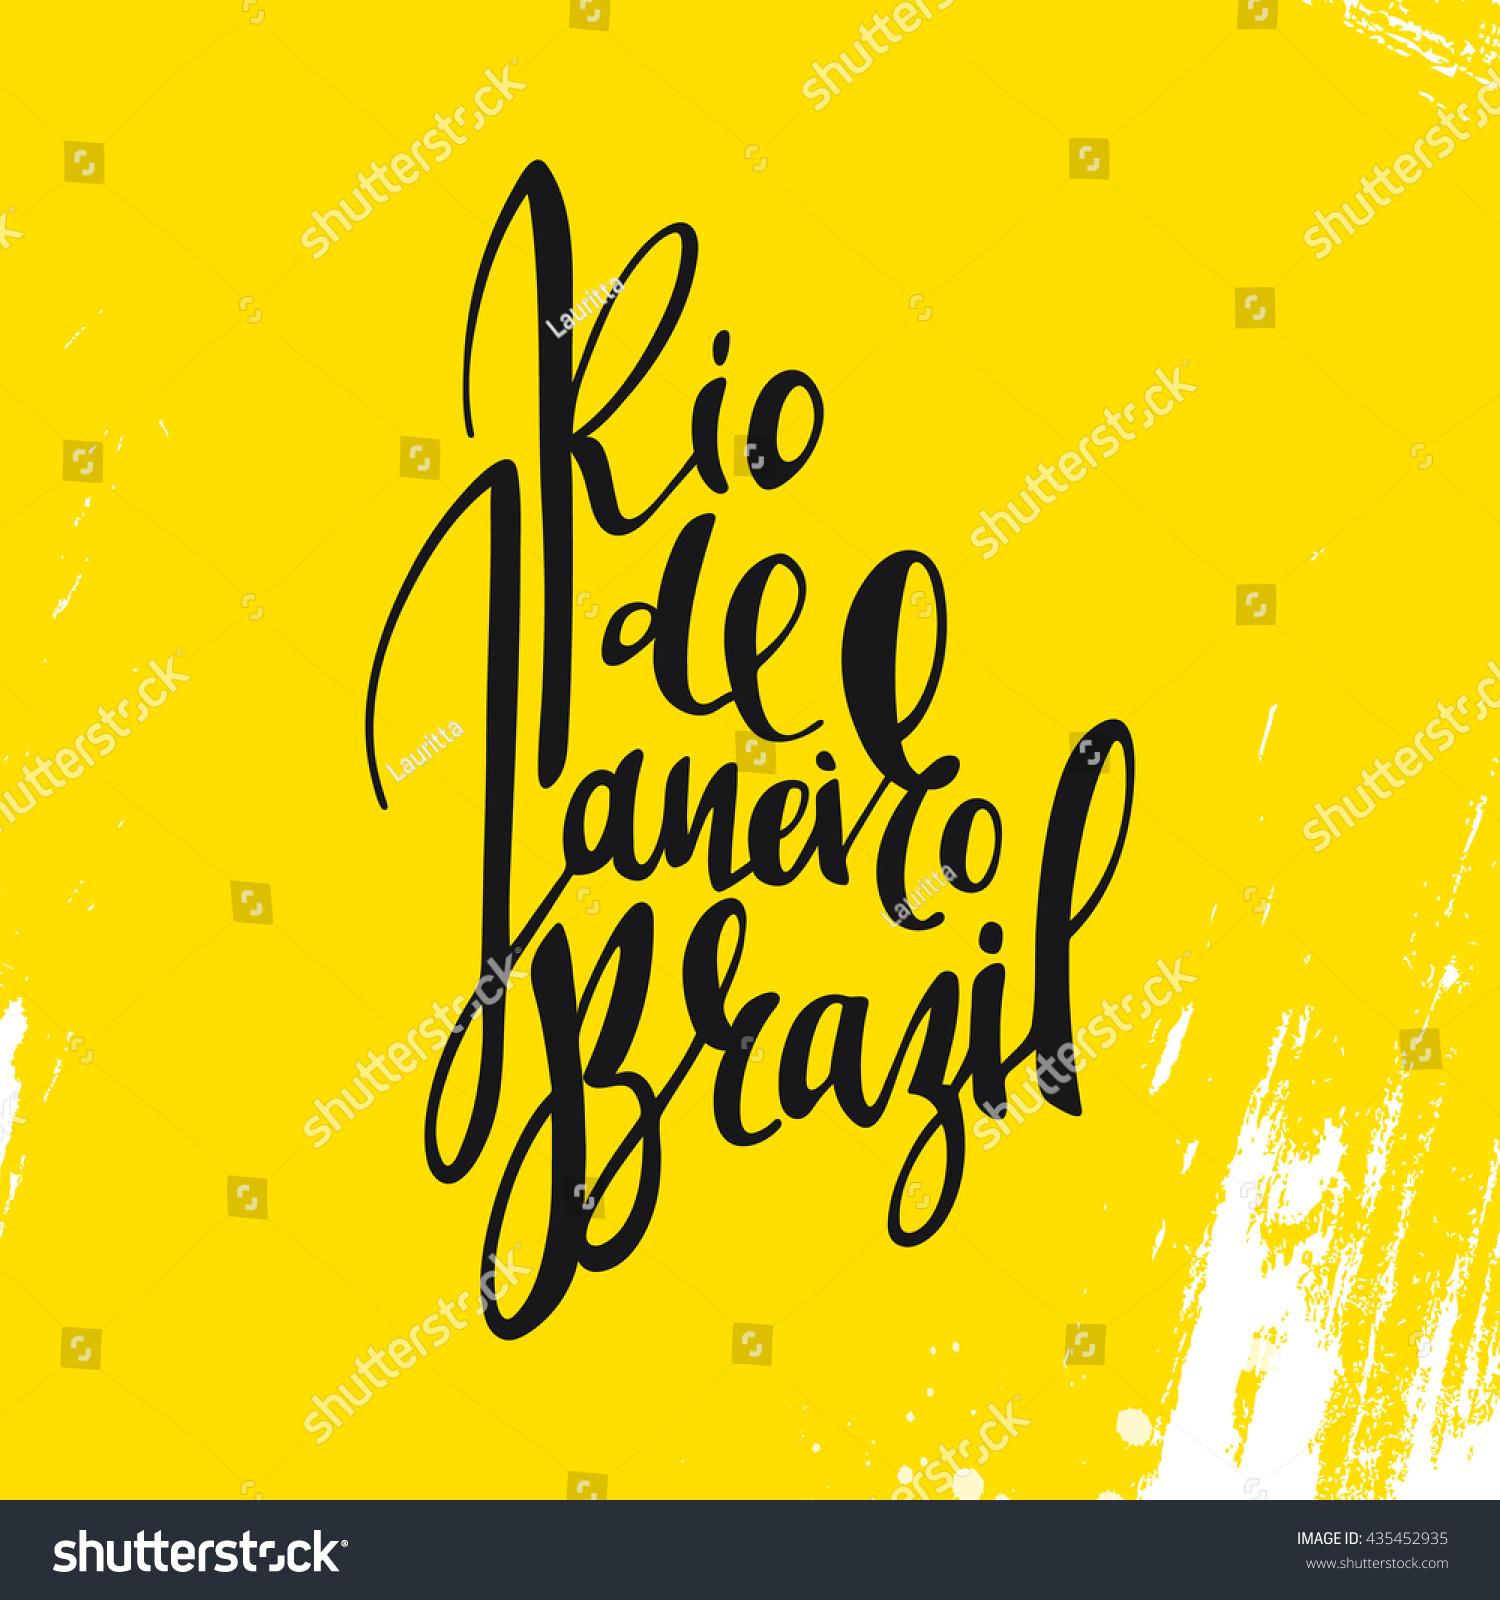 Handmade watercolor brazil flag brasil stock photos freeimages com - Inscription Rio De Janeiro Brazil Background Yellow Calligraphy Handmade Greeting Cards Posters Watercolor